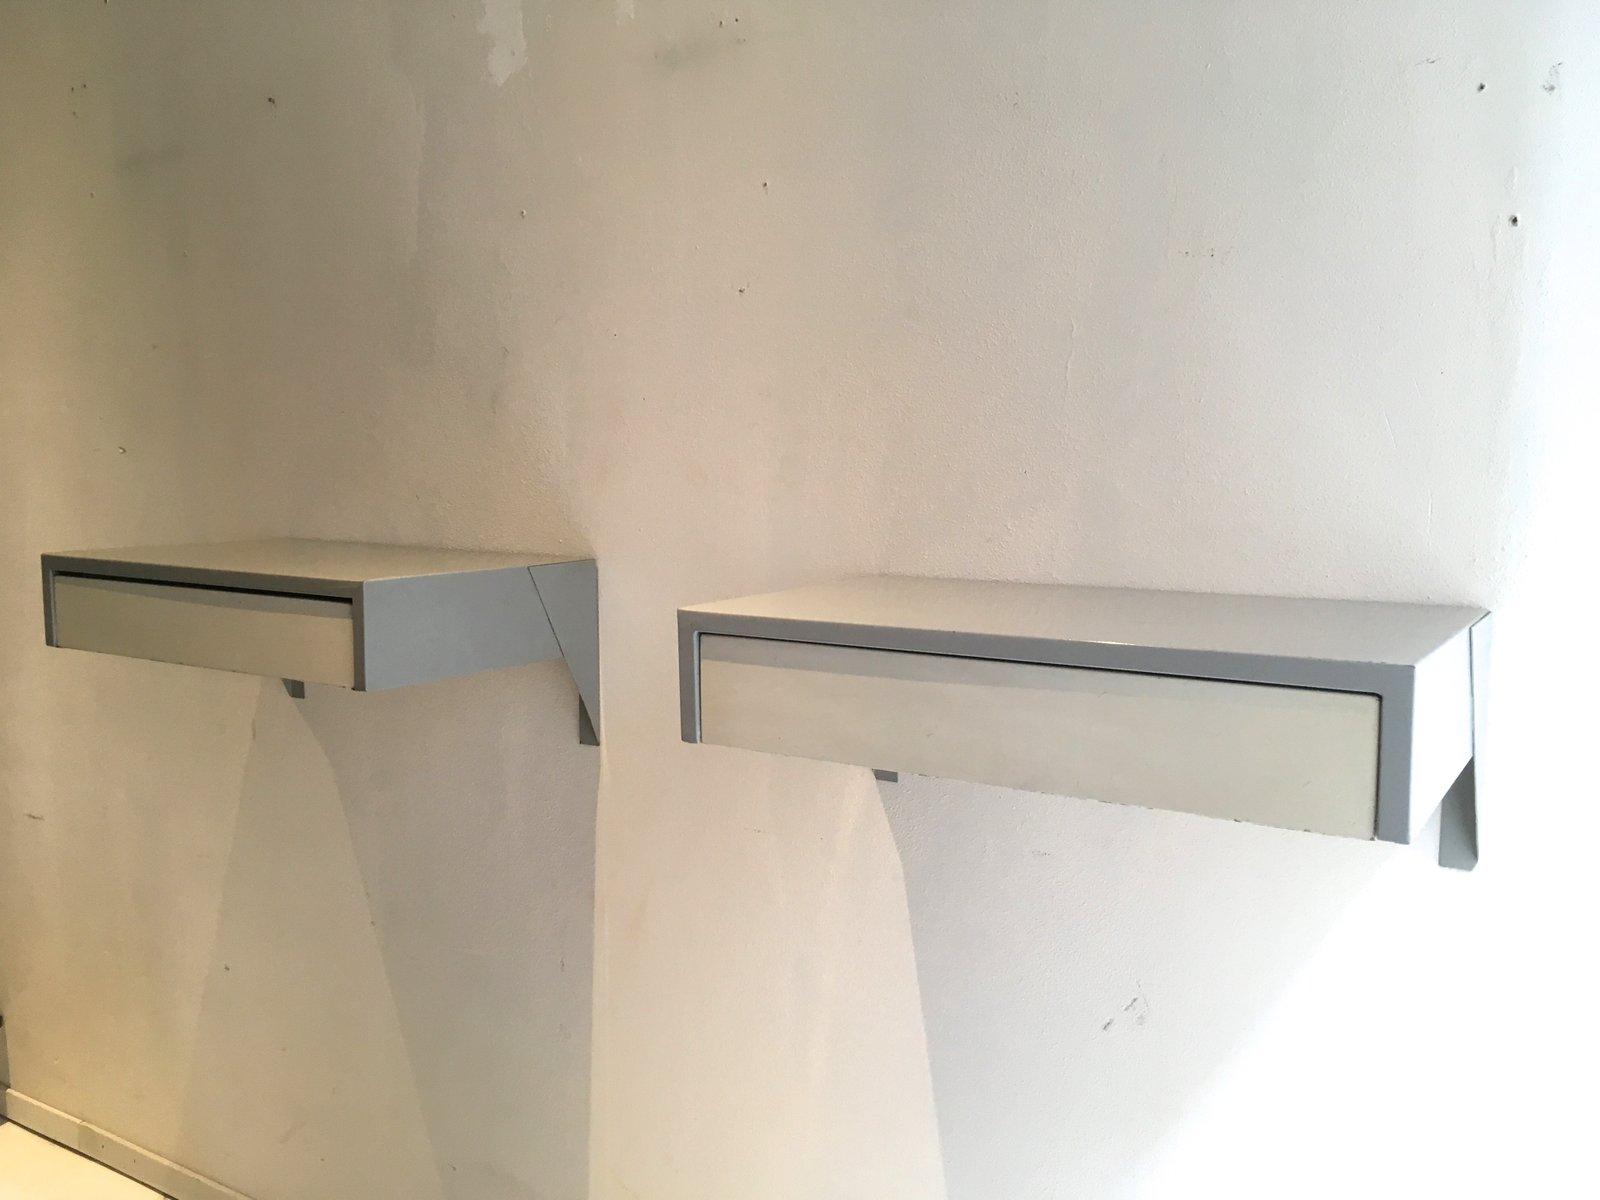 DD01 Wall Mounted Bedside Cabinets By Martin Visser For U0027t Spectrum, 1956,  Set Of 2